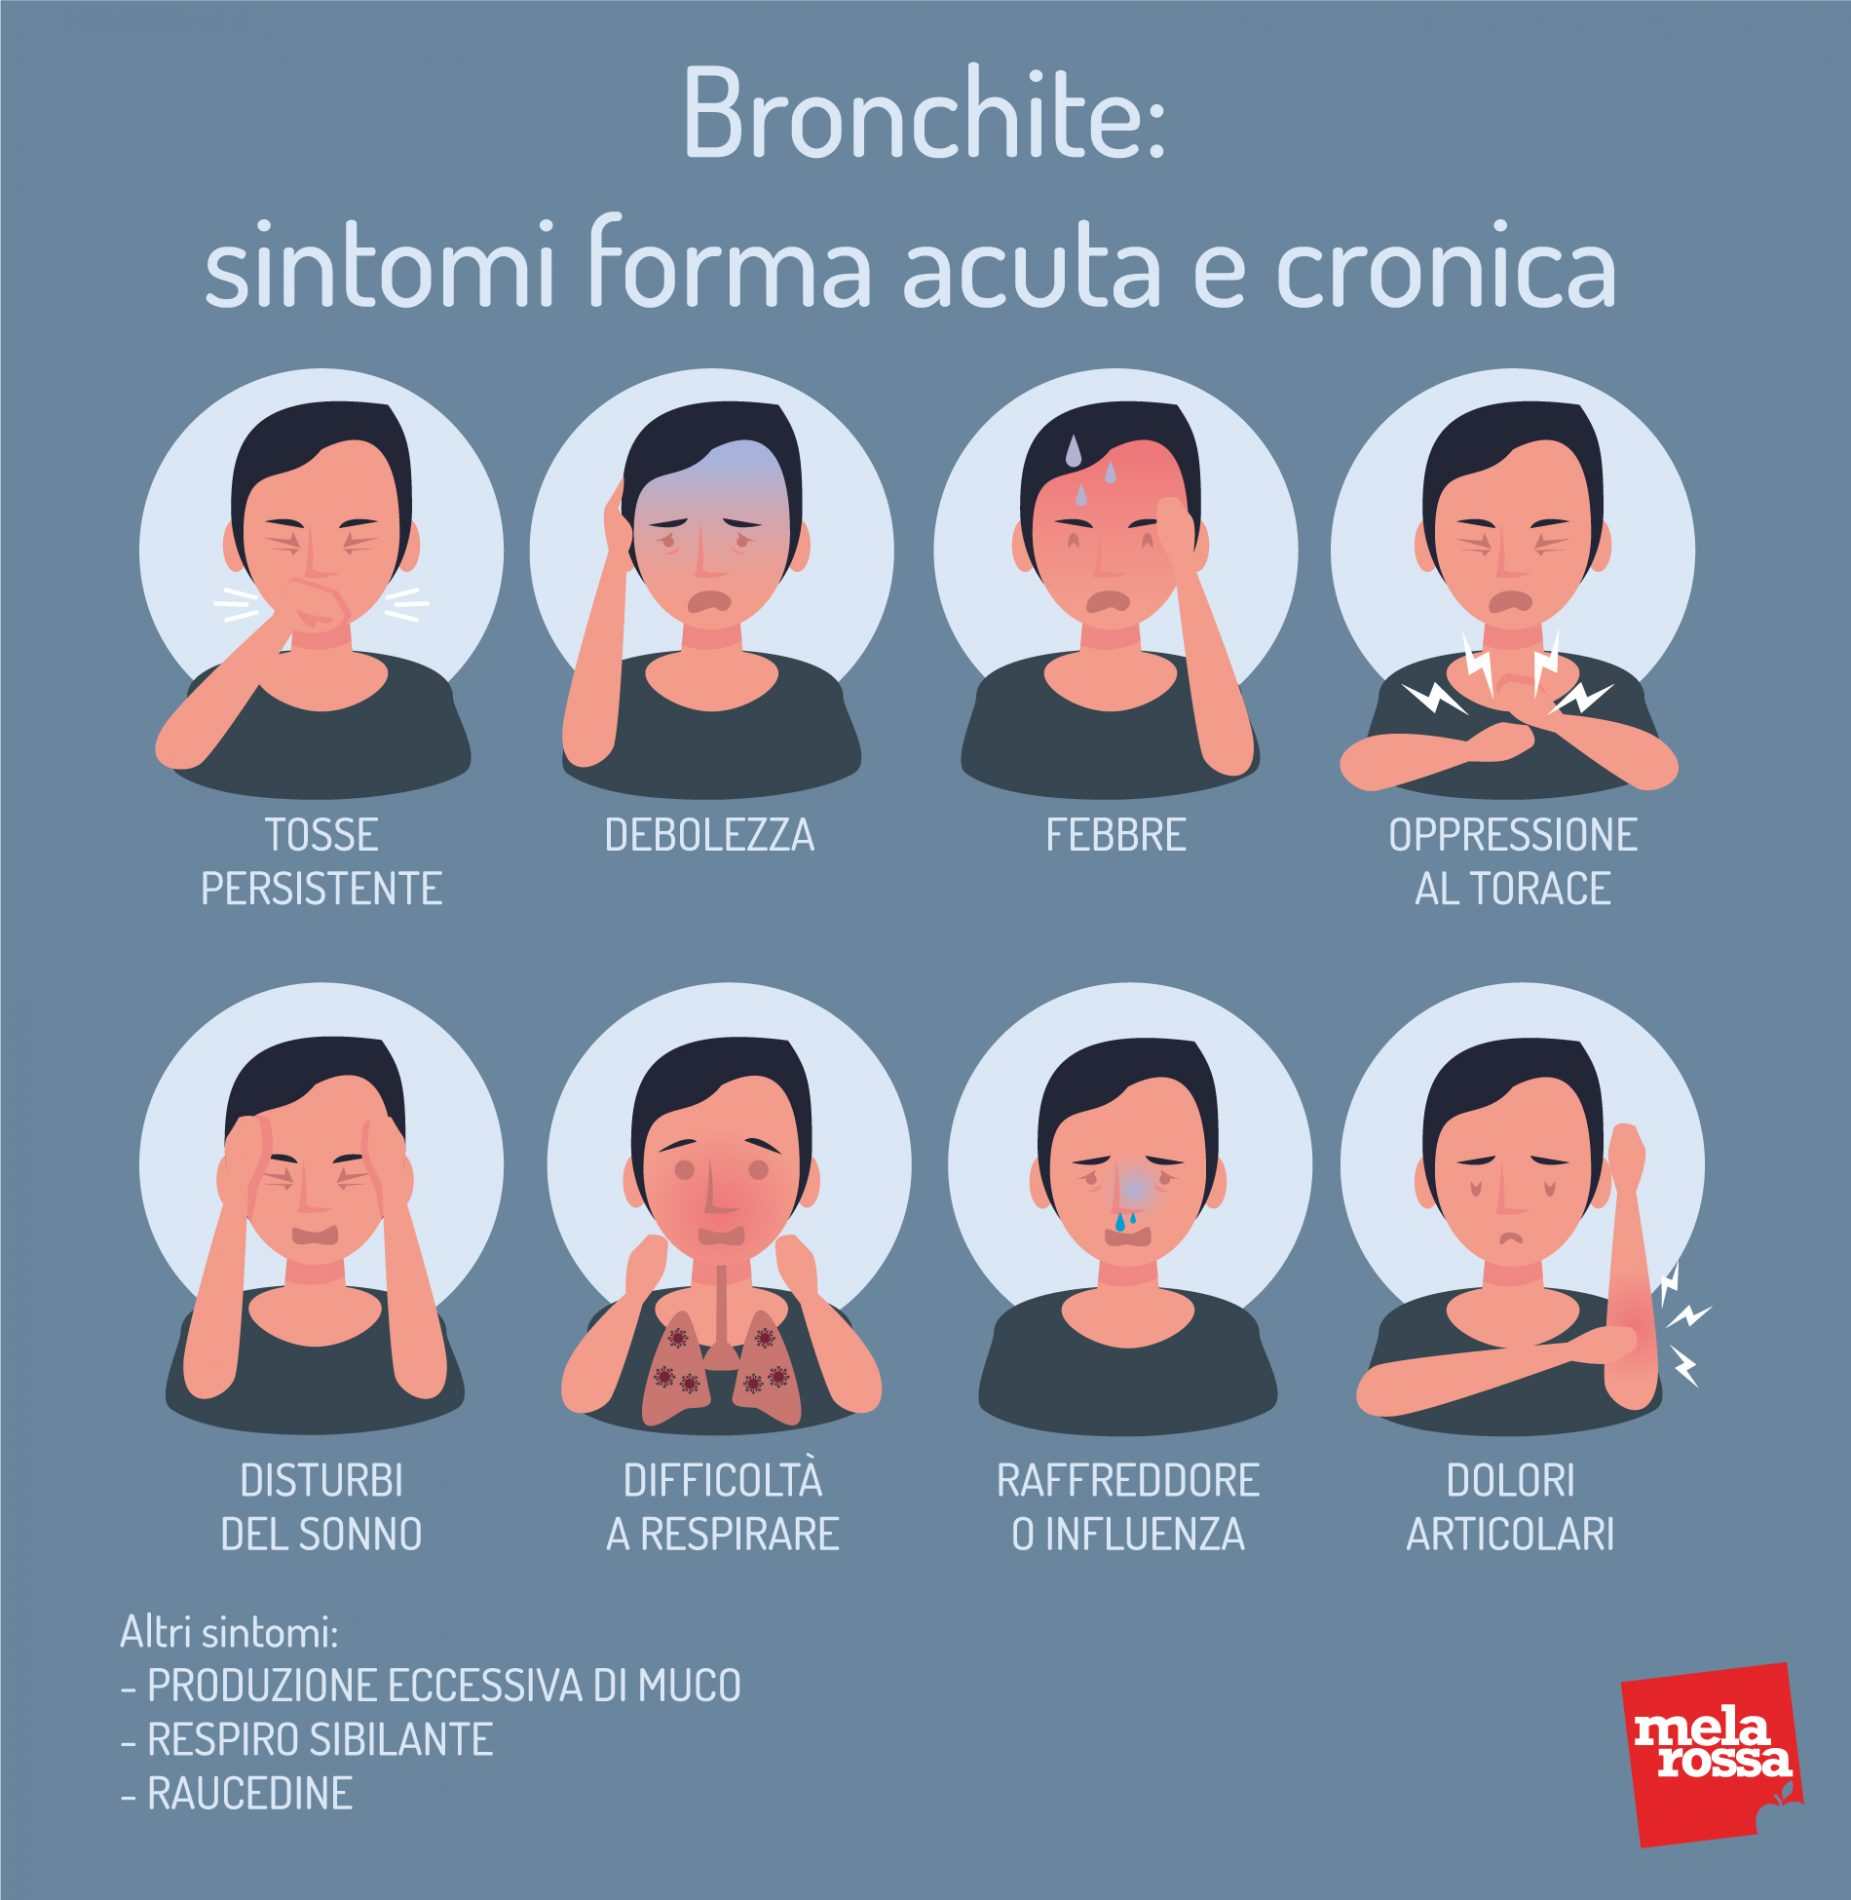 Bronchite: sintomi forma acuta e cronica